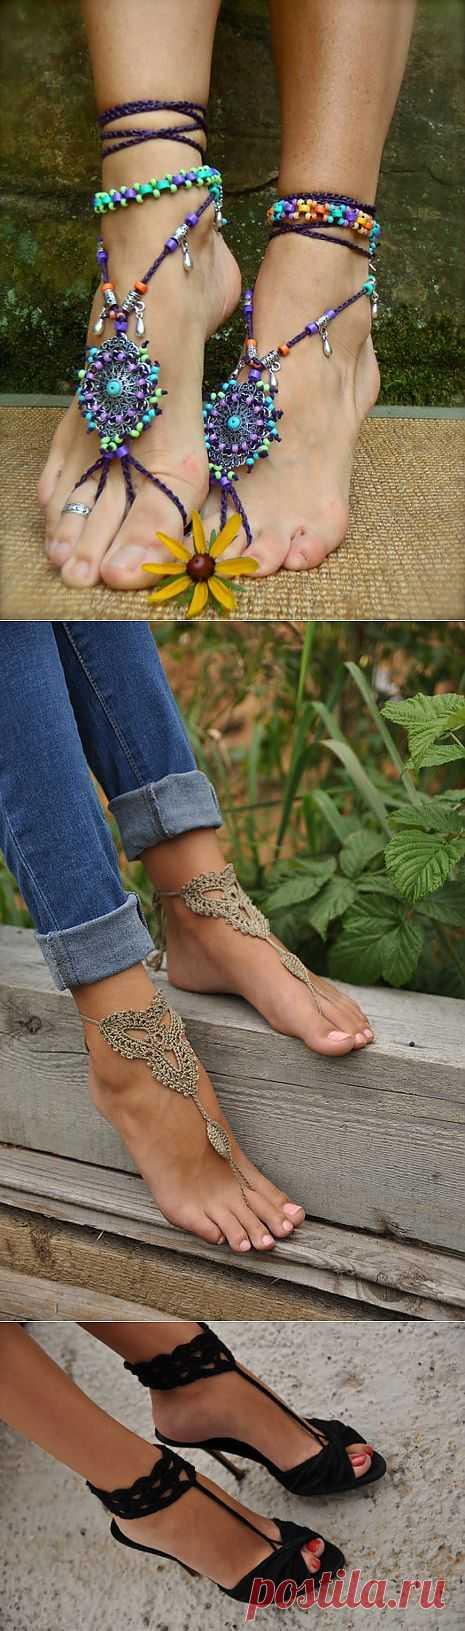 Босые ножки....